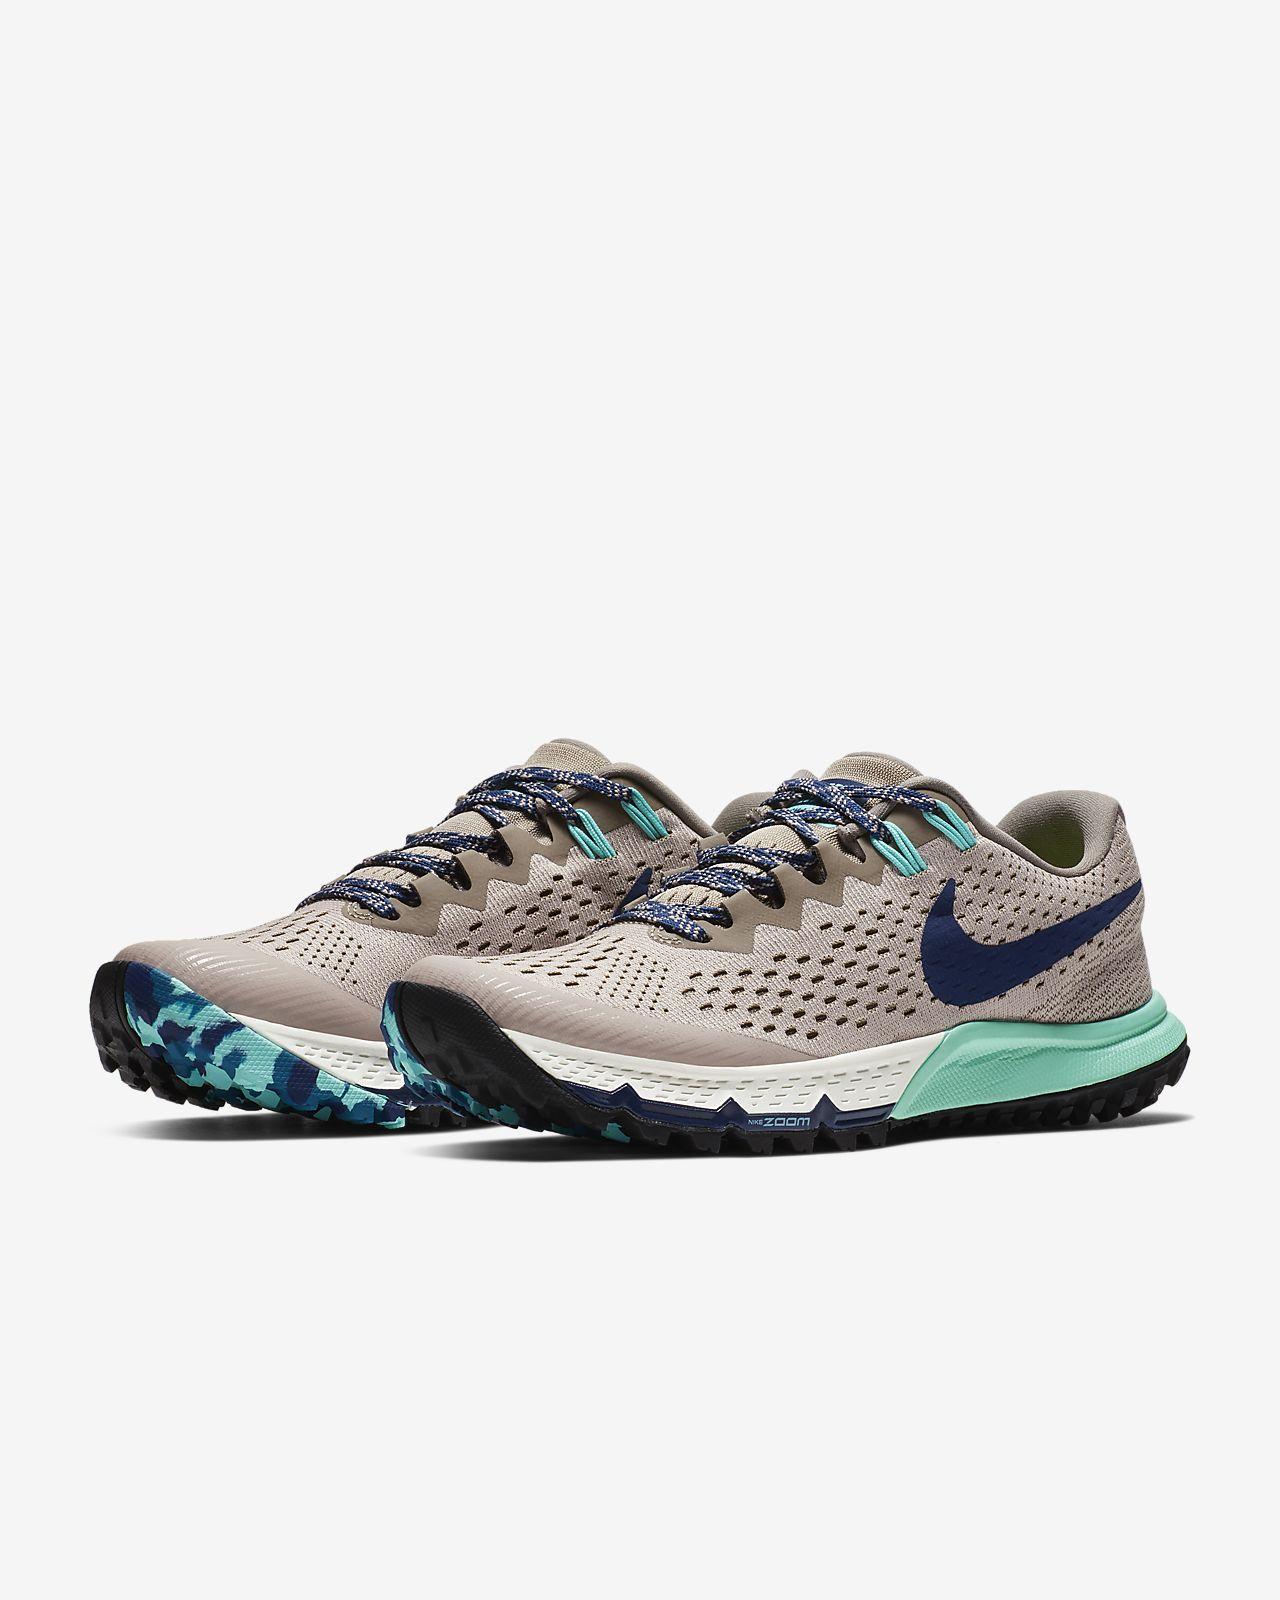 3457a82eabe25 Nike Air Zoom Terra Kiger 4 Women s Running Shoe. Nike.com